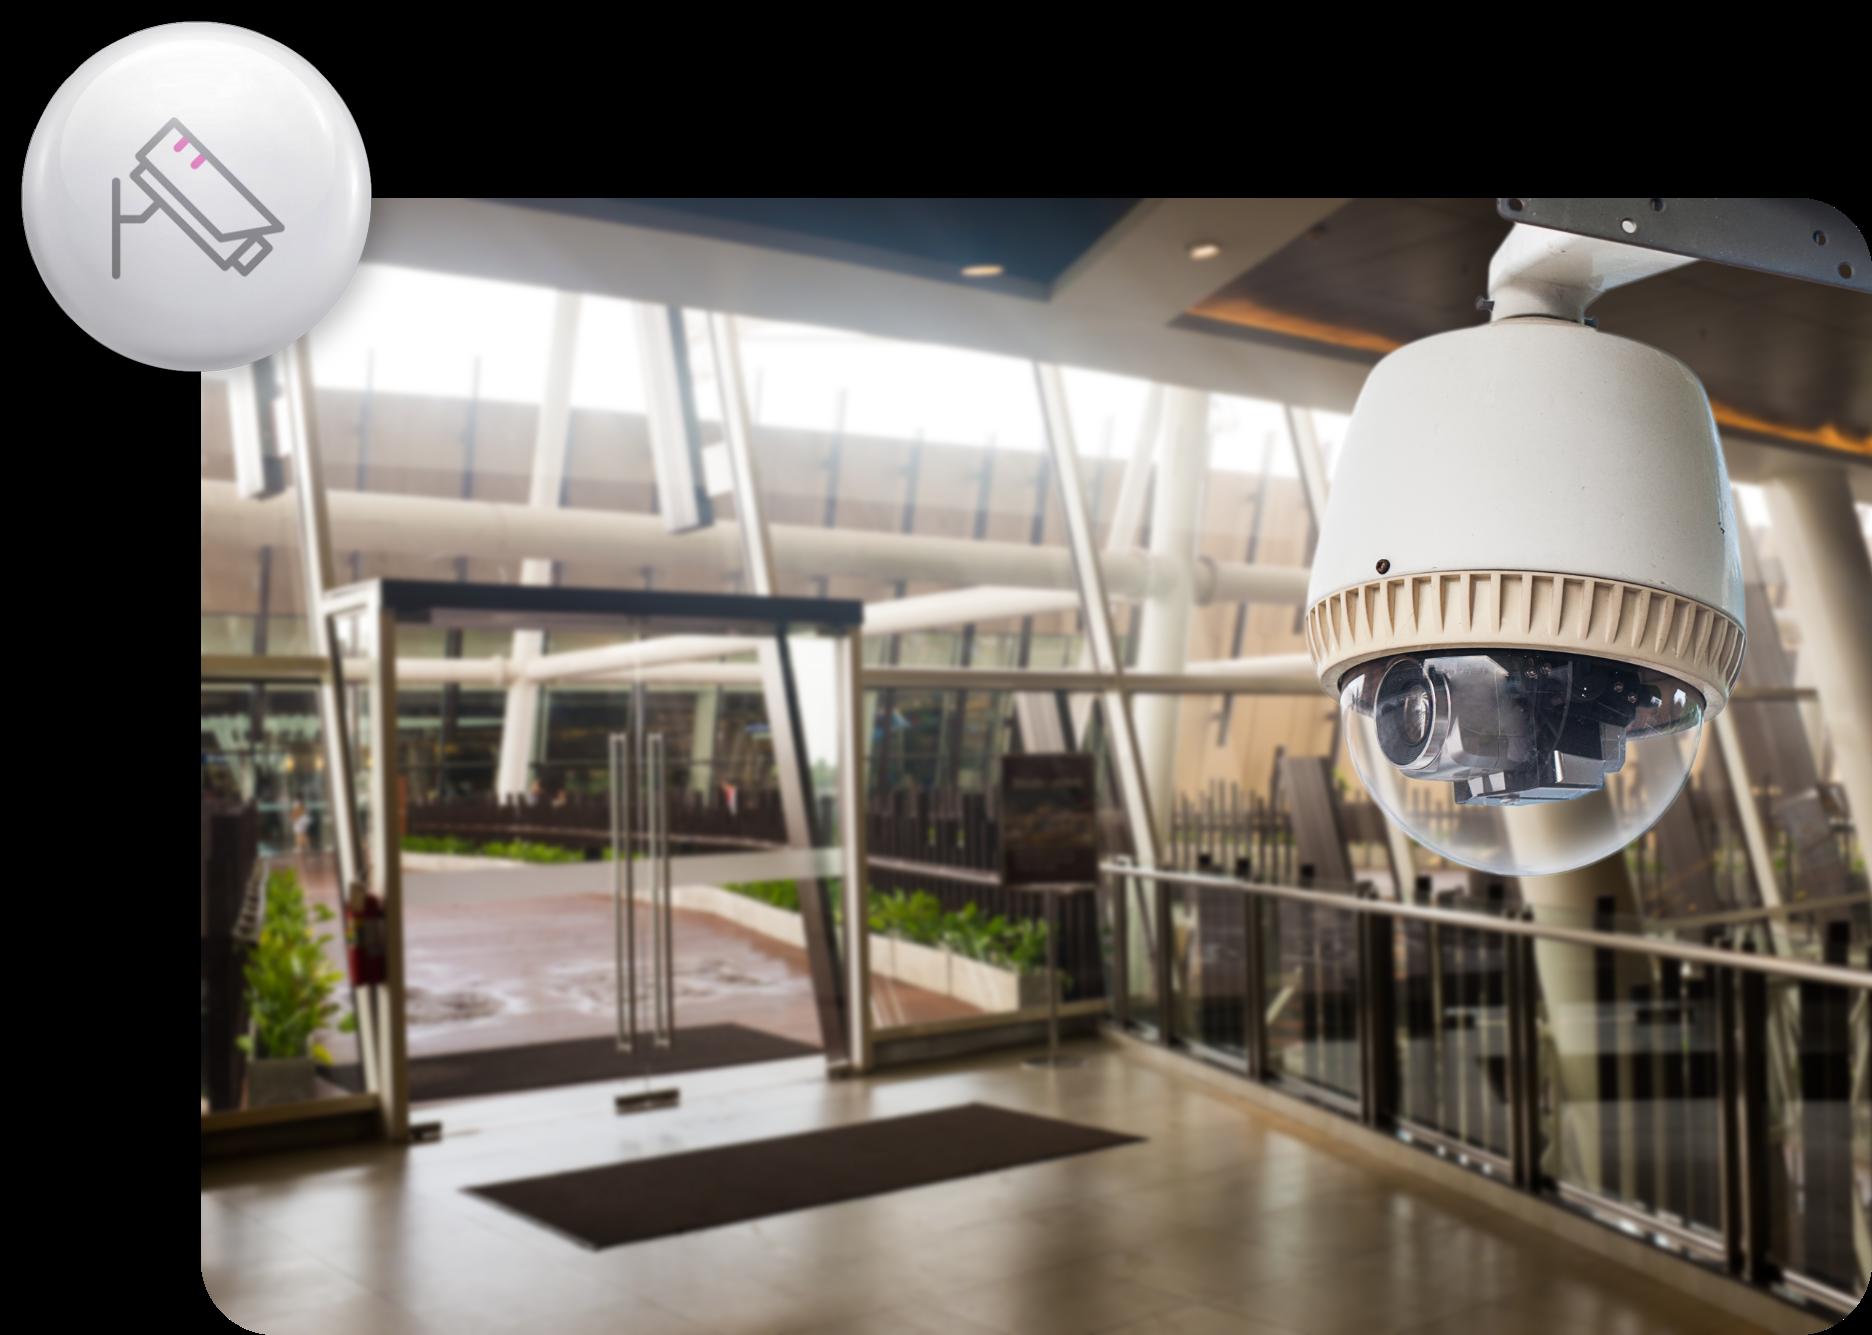 Business Security CCTV Camera